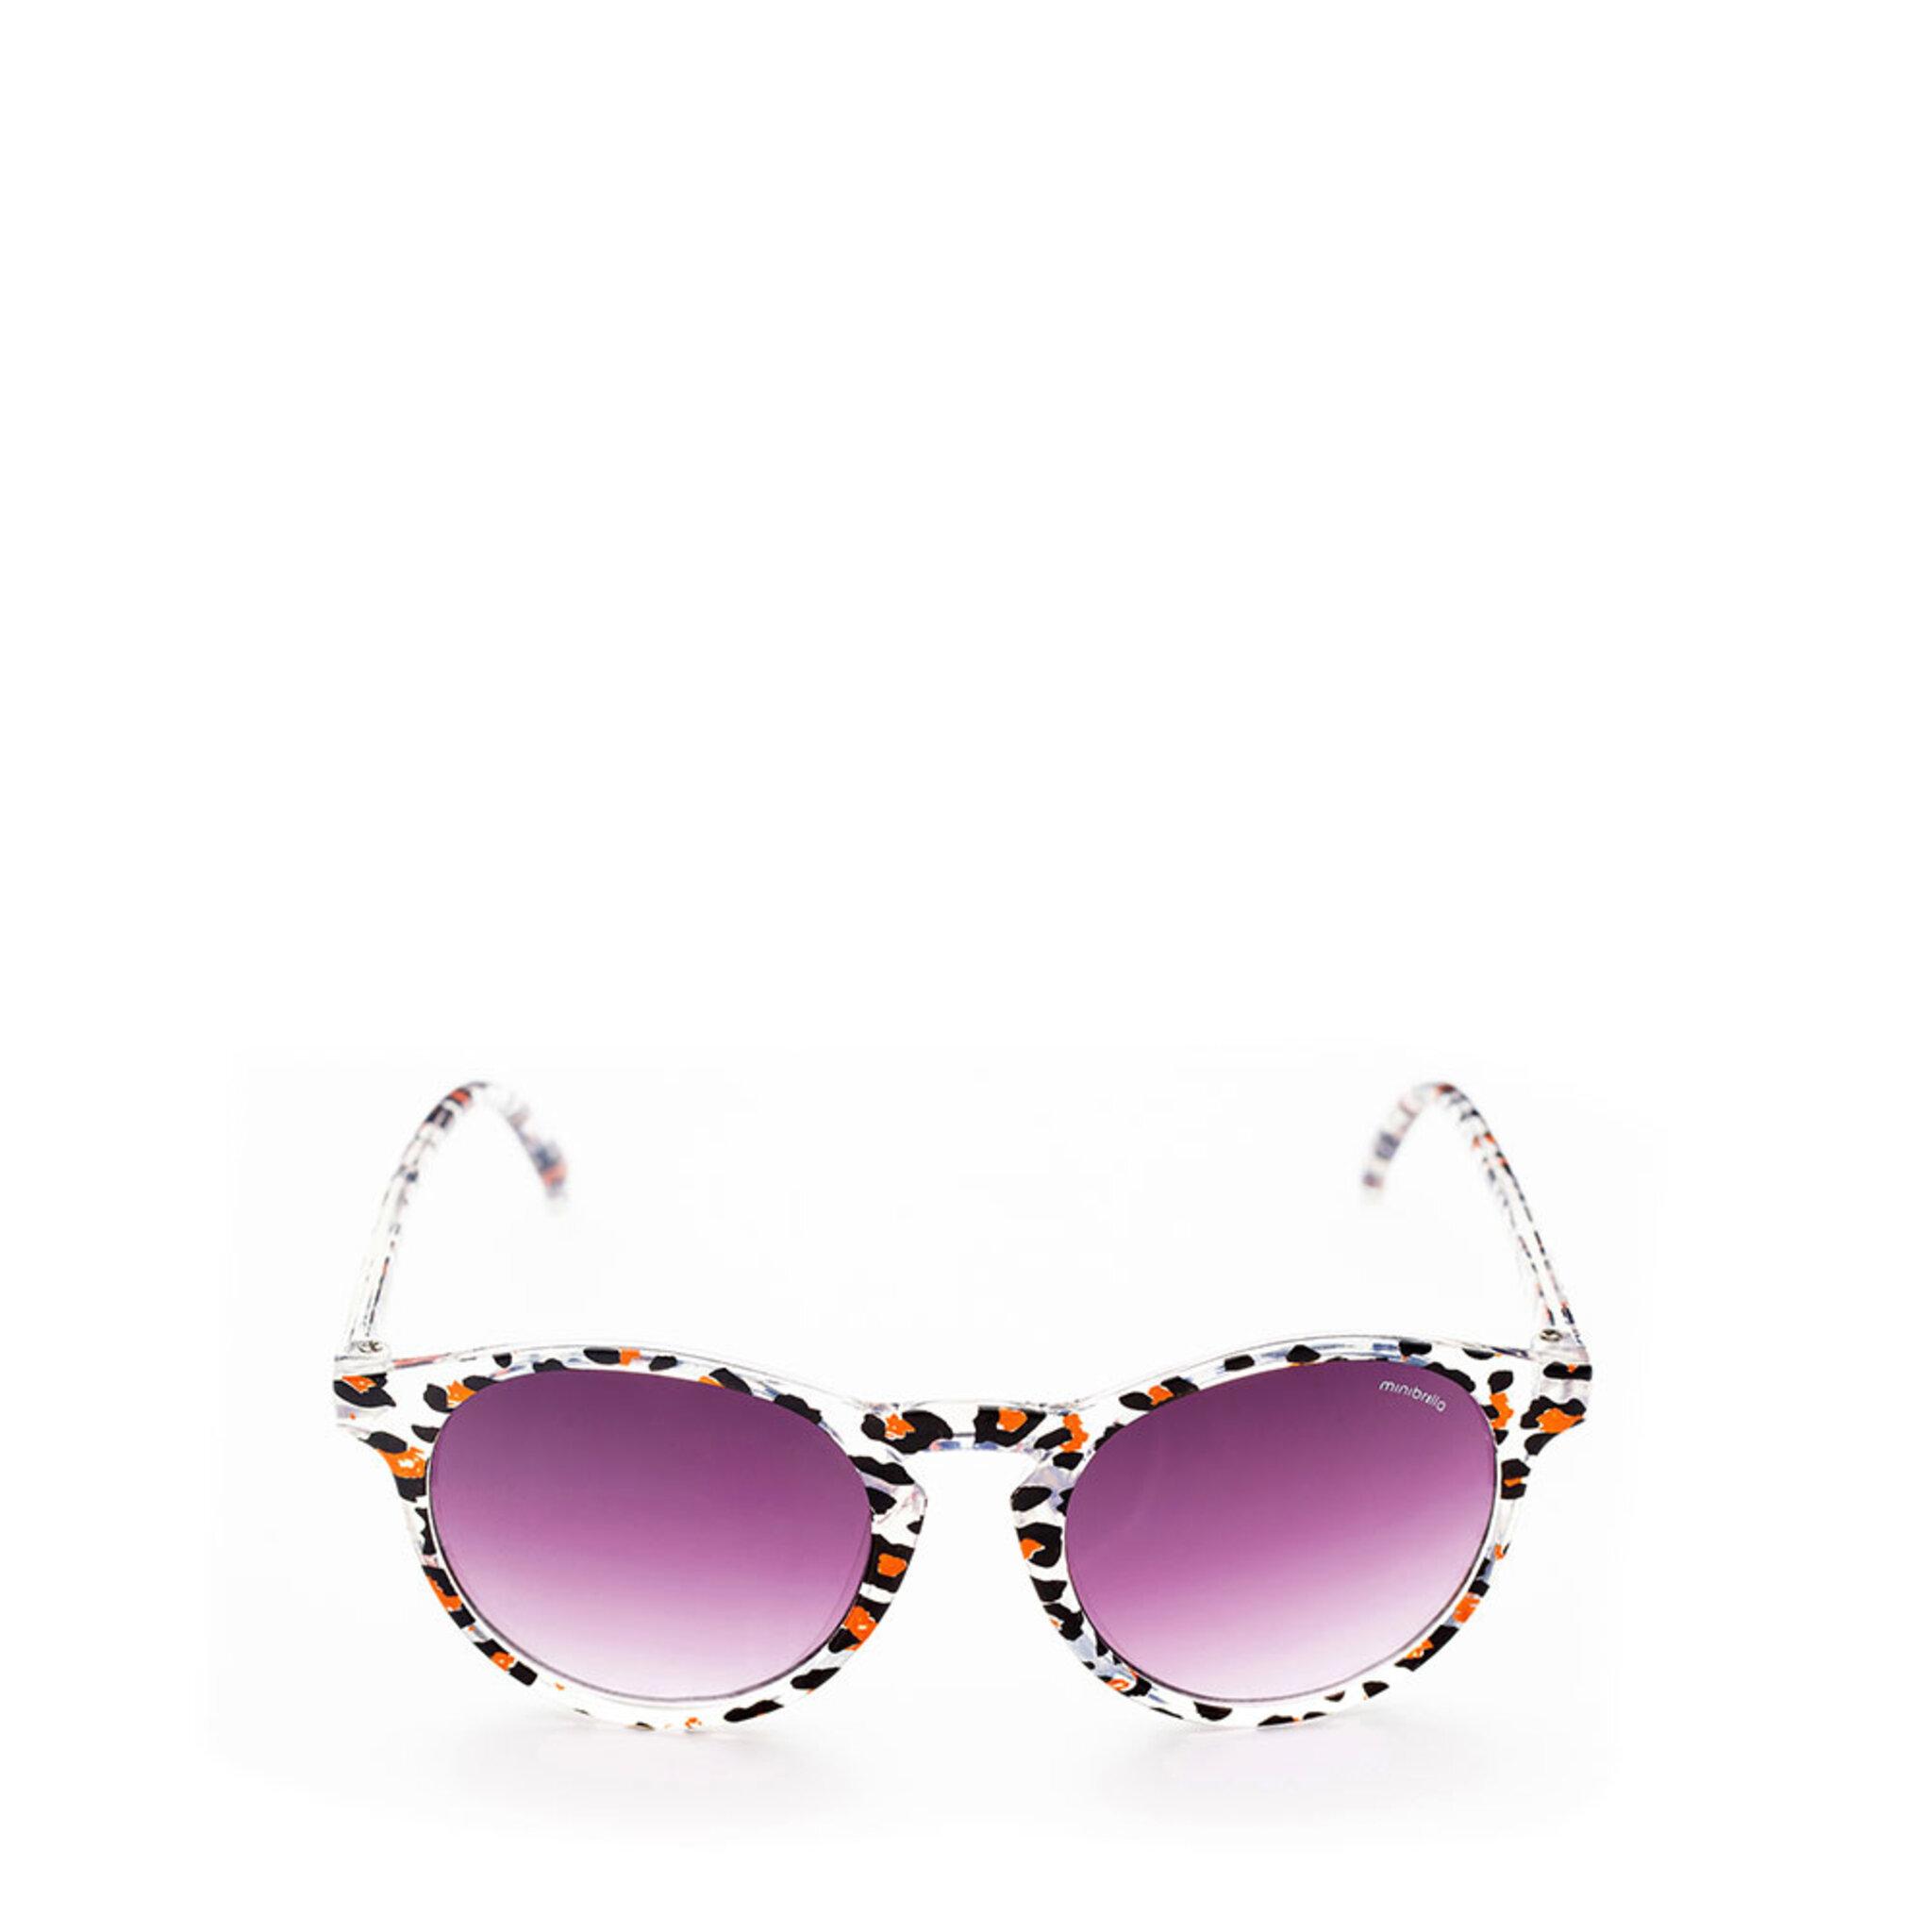 Lykke barnsolglasögon